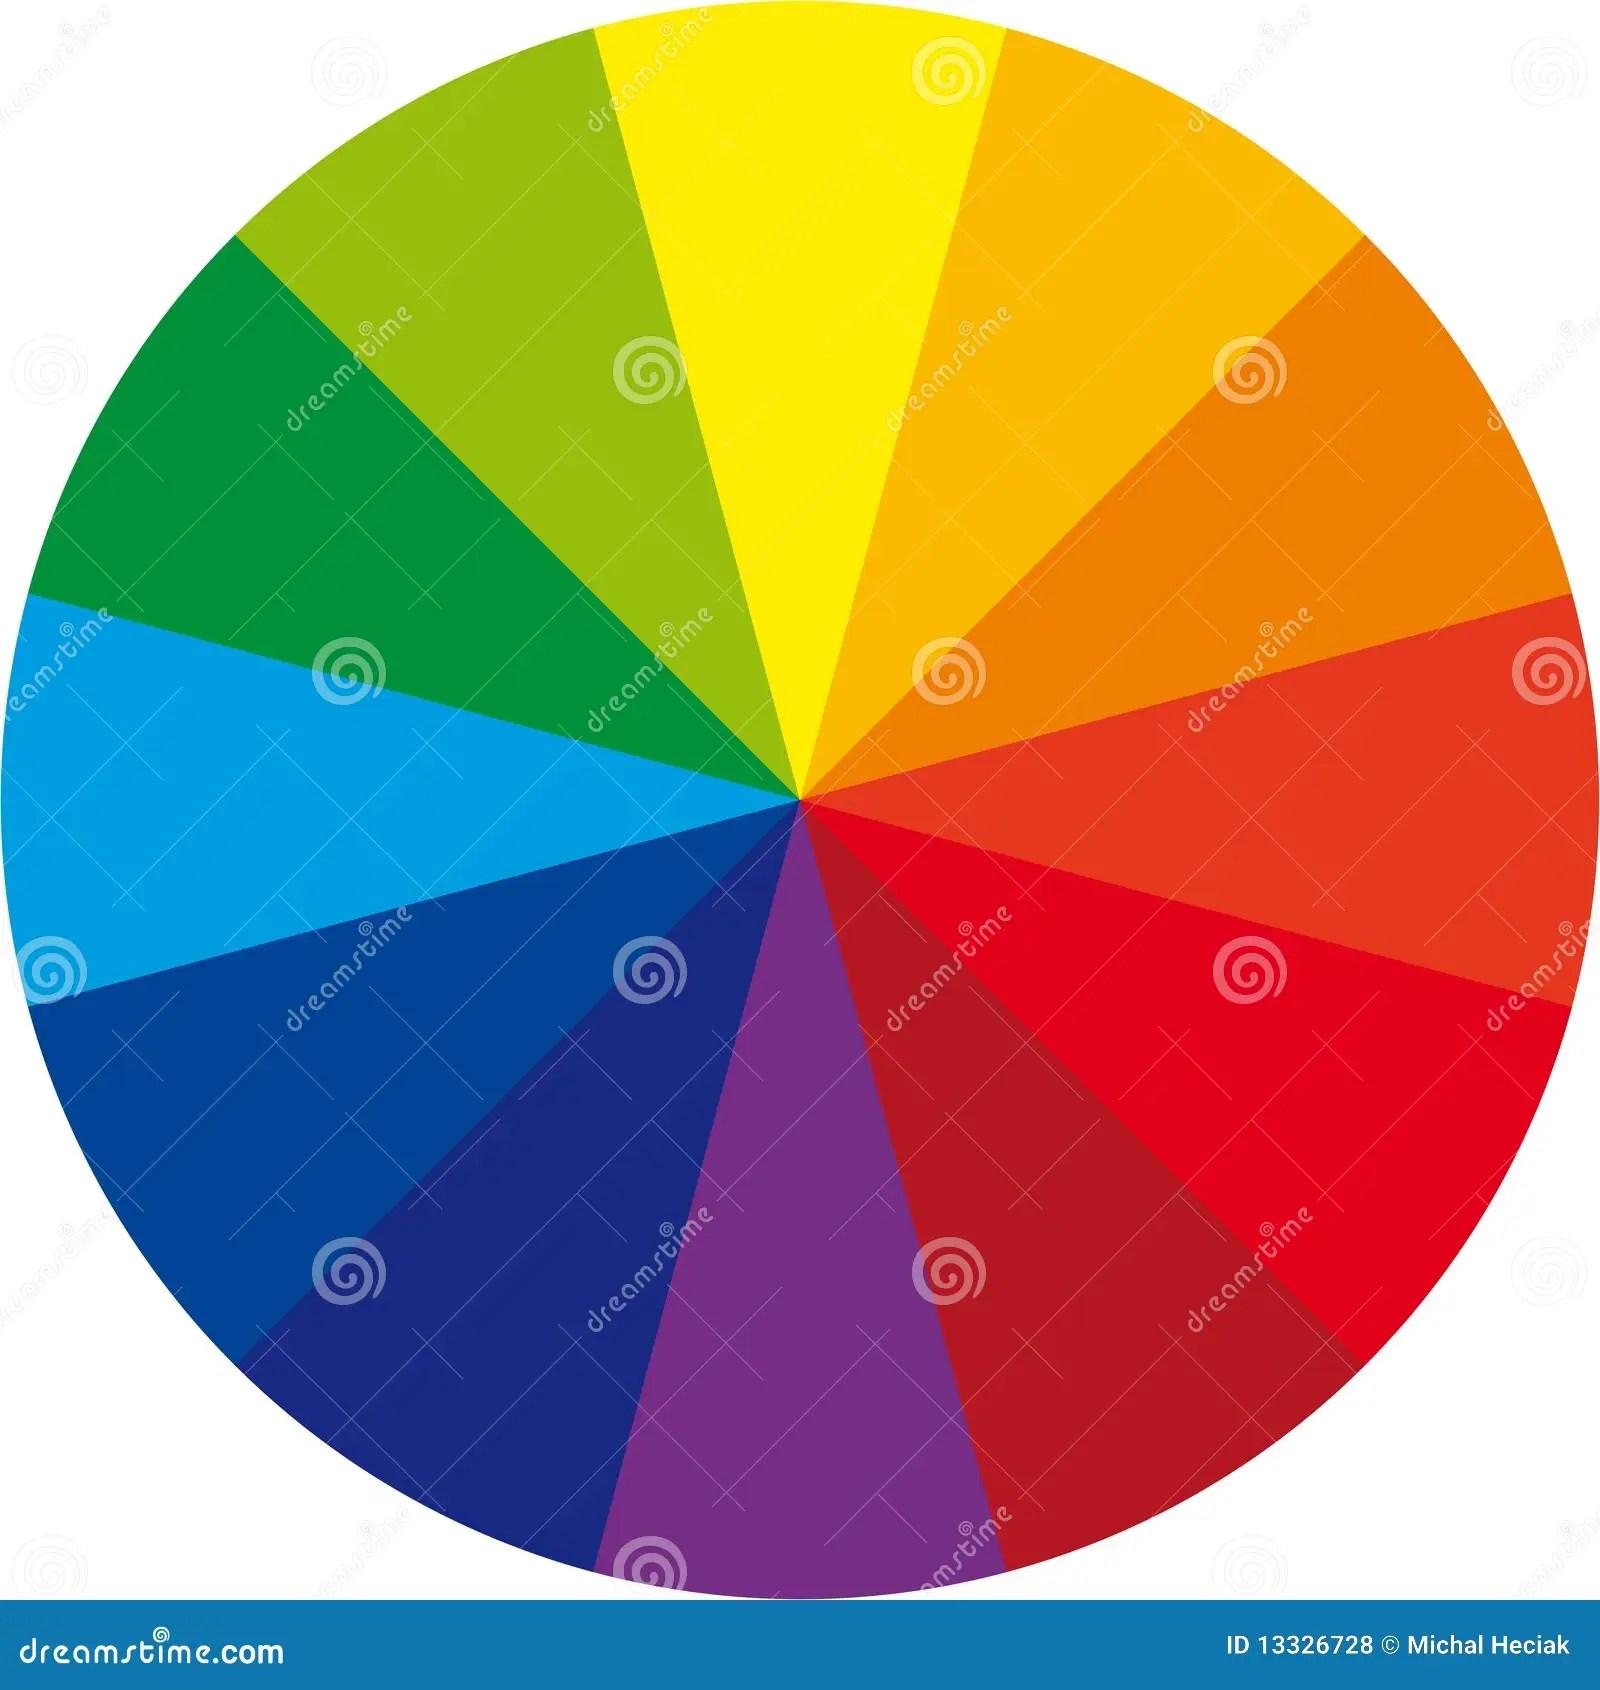 Basic Color Wheel Royalty Free Stock Photos